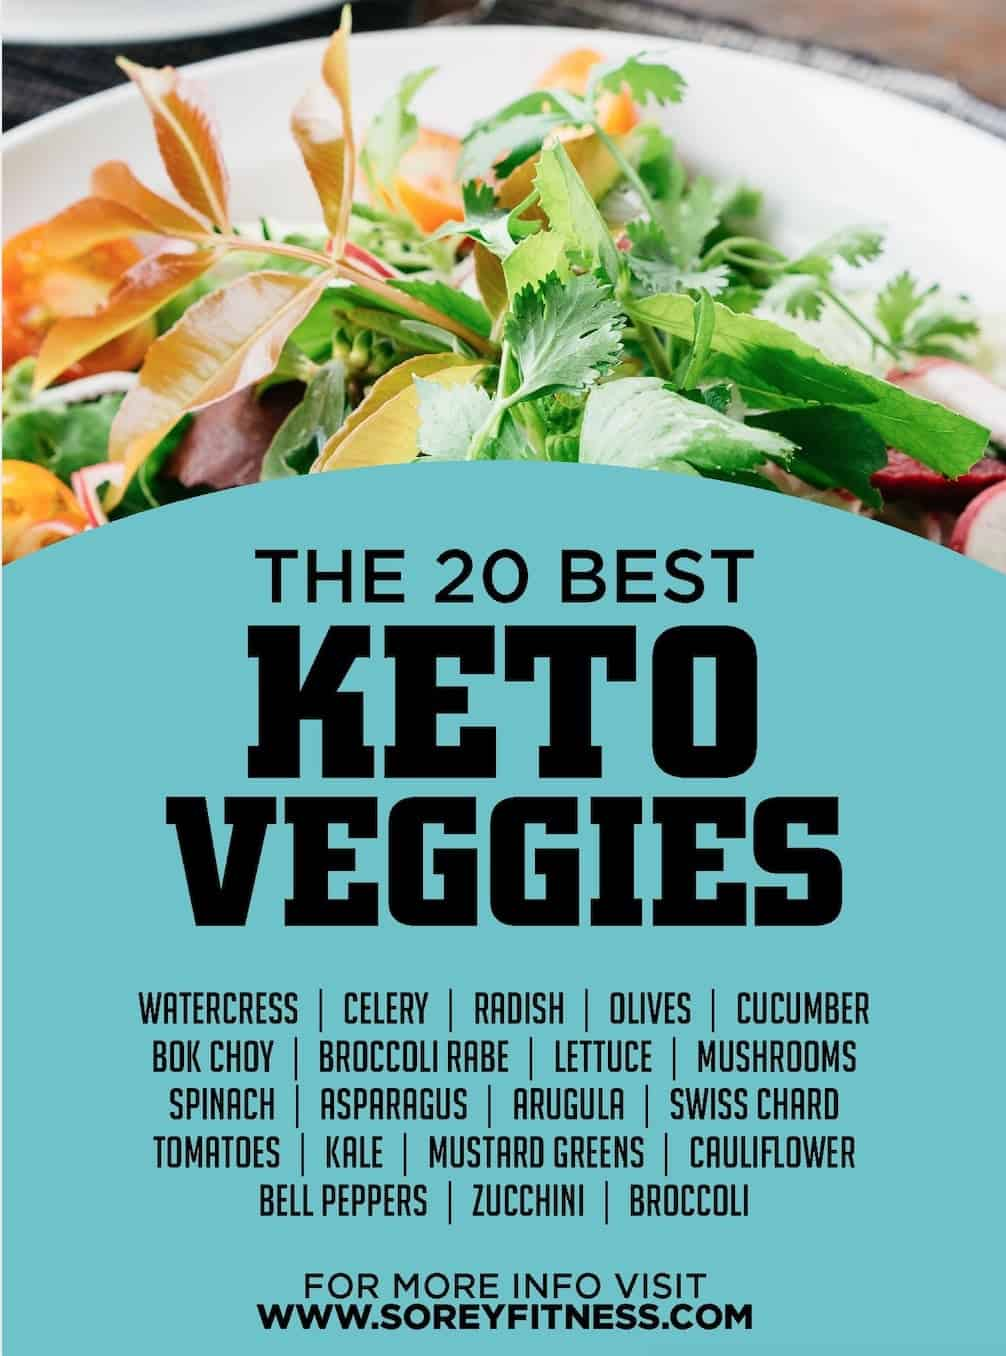 List of the 20 Best Keto Veggies